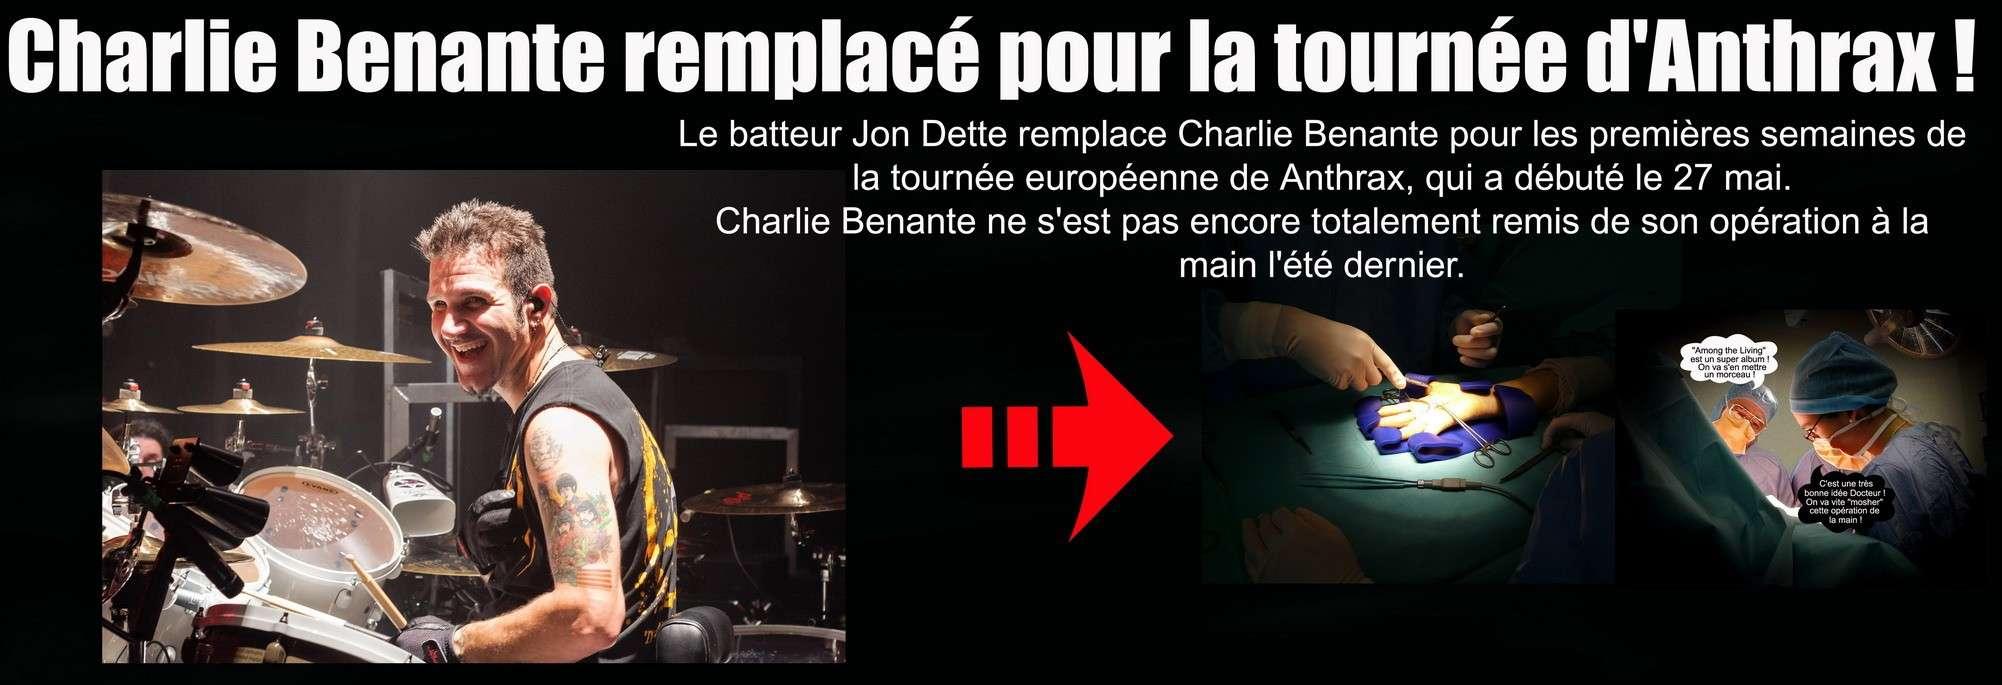 Les NEWS du METAL en VRAC ... - Page 3 Charli11